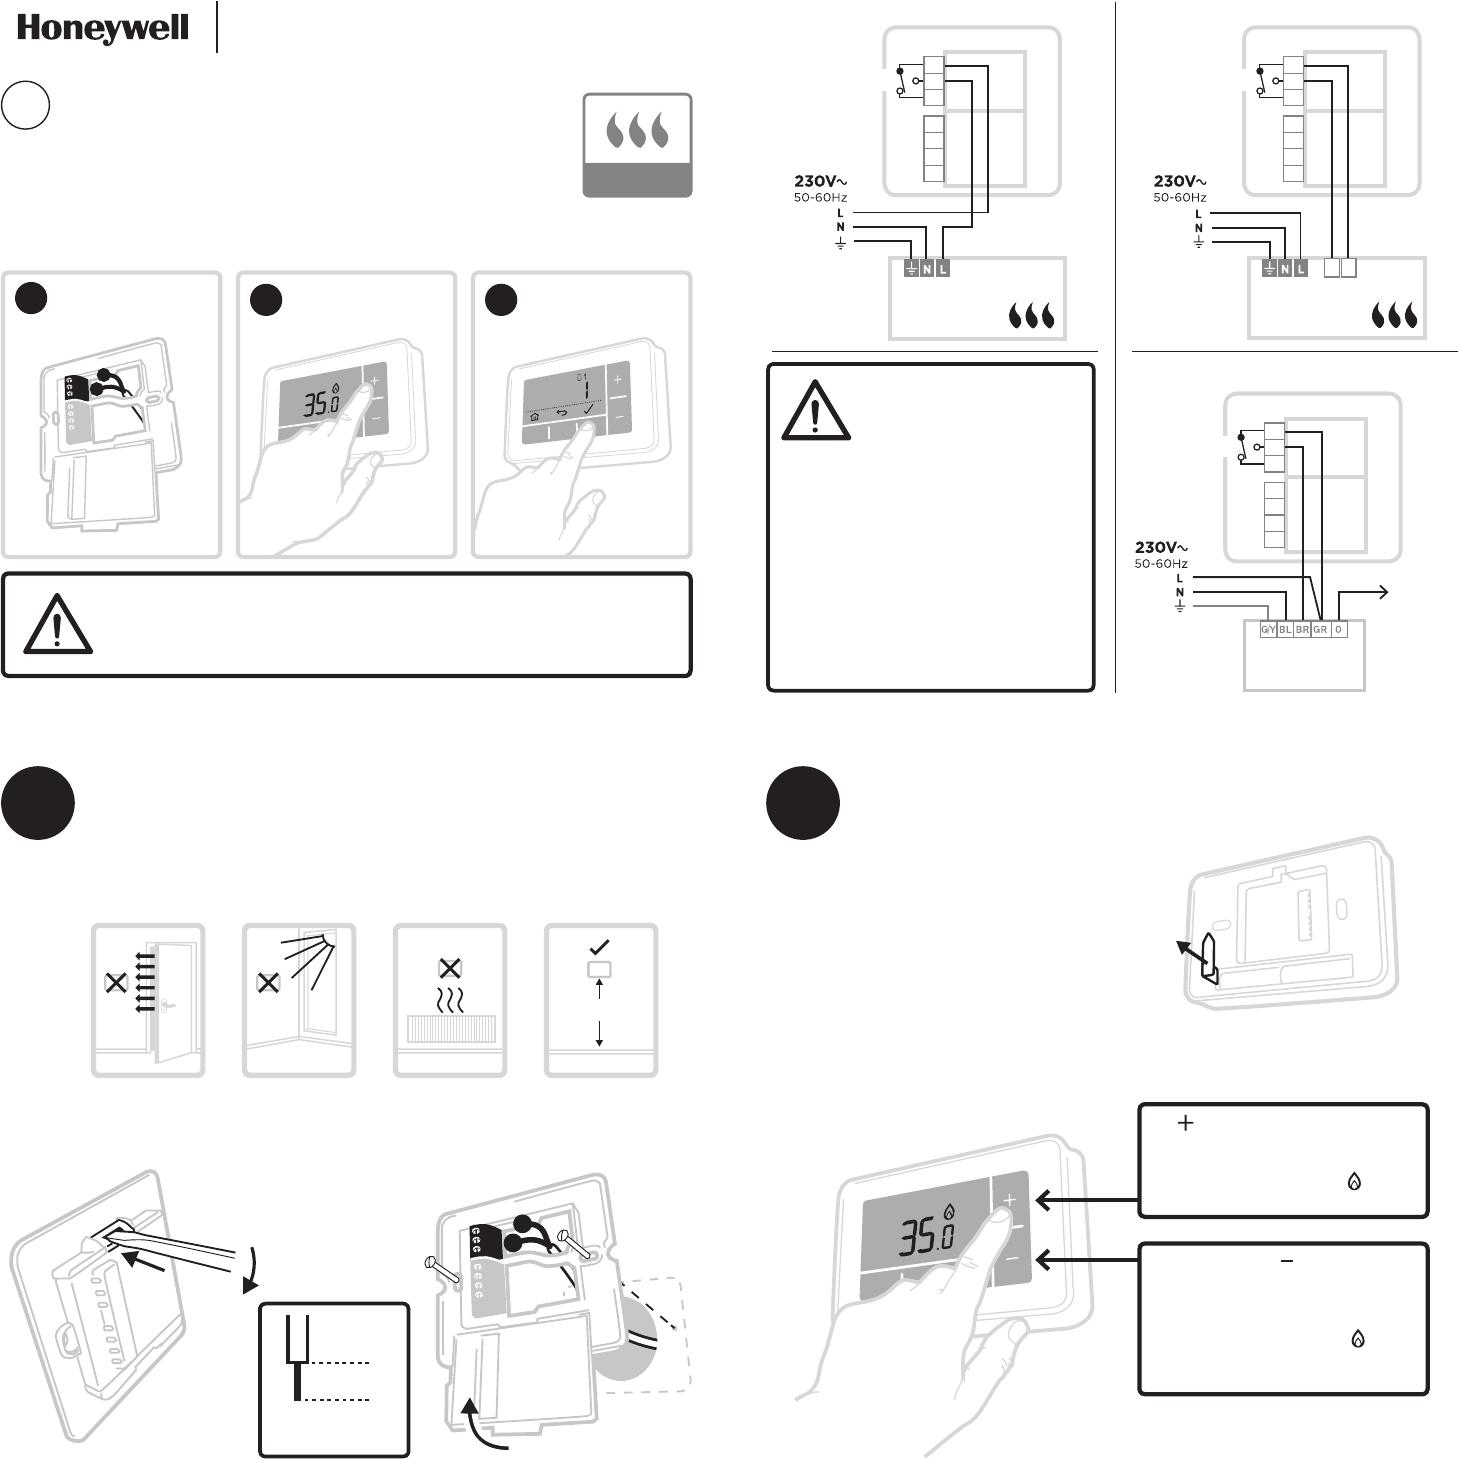 Enterobacteria Phage T4 Manual Guide